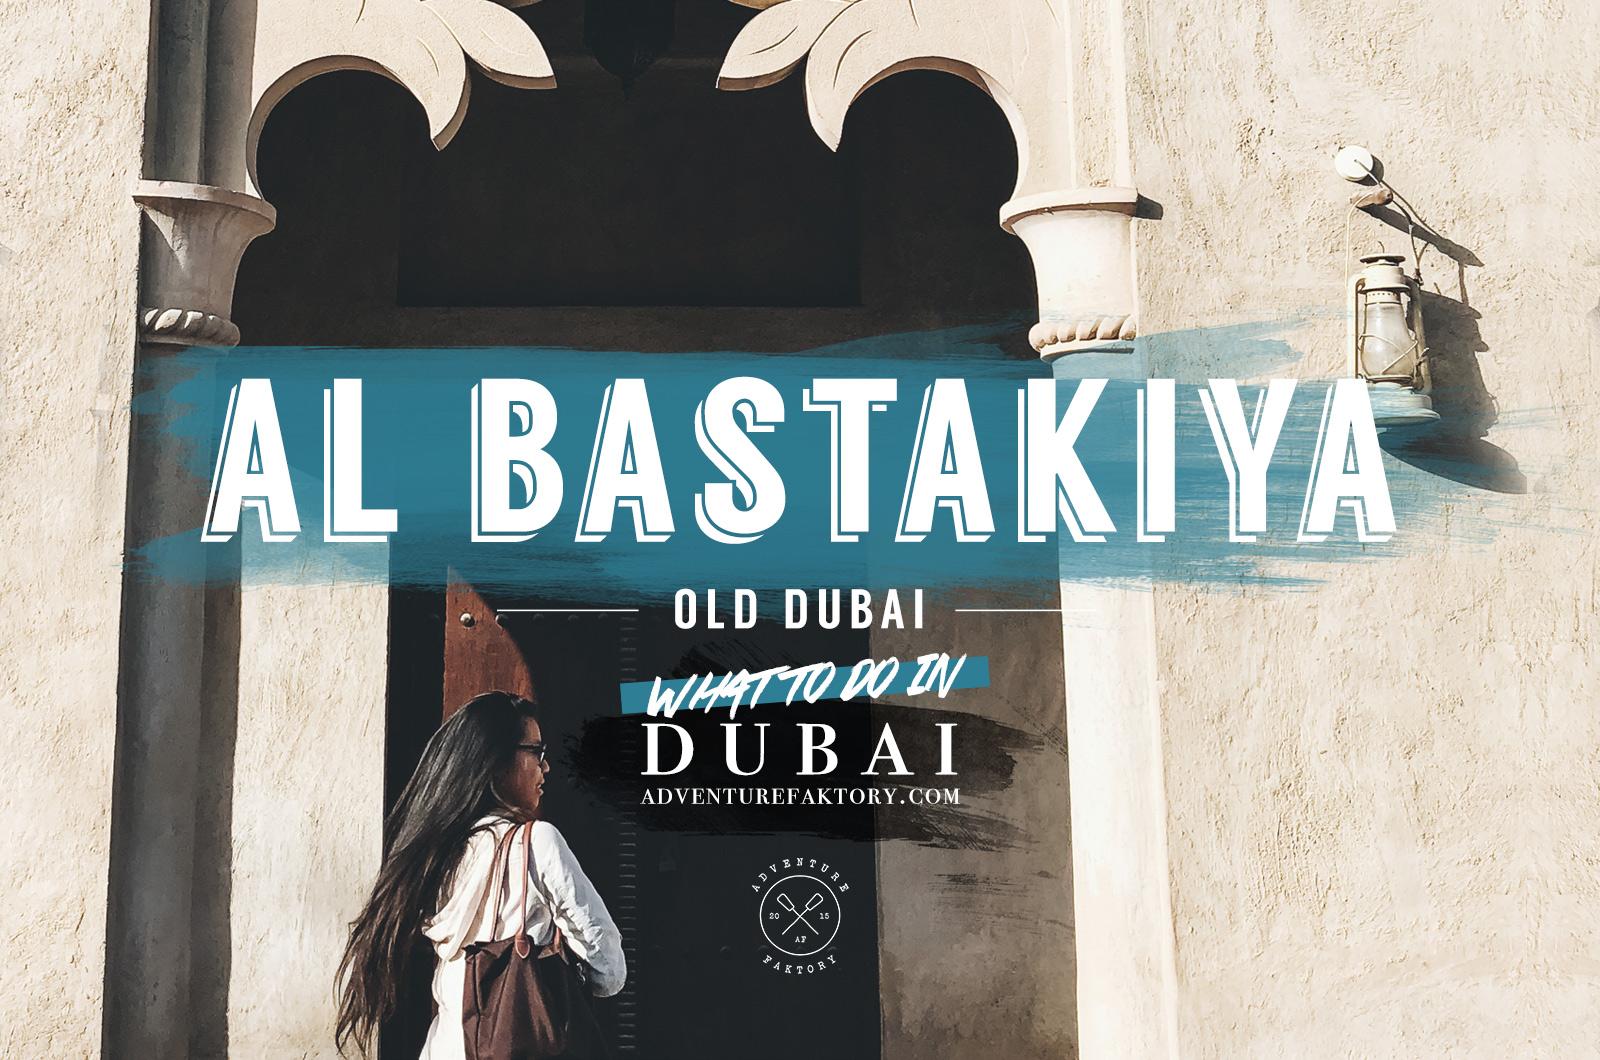 What to do in Old Dubai: Al Bastakiya